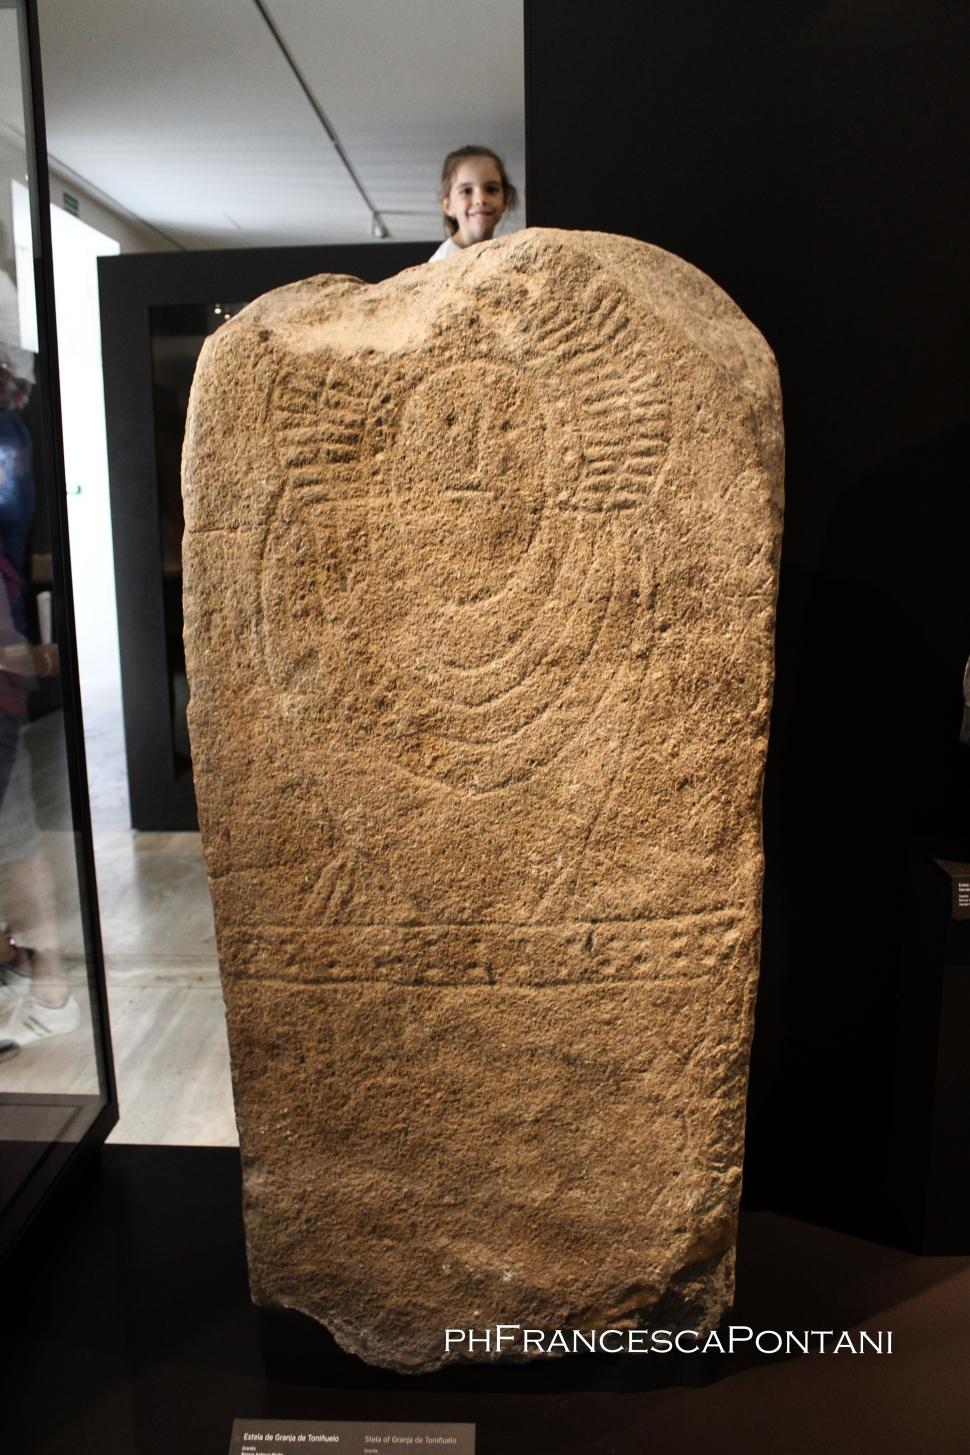 madrid_museo_archeologico_stele_femminile